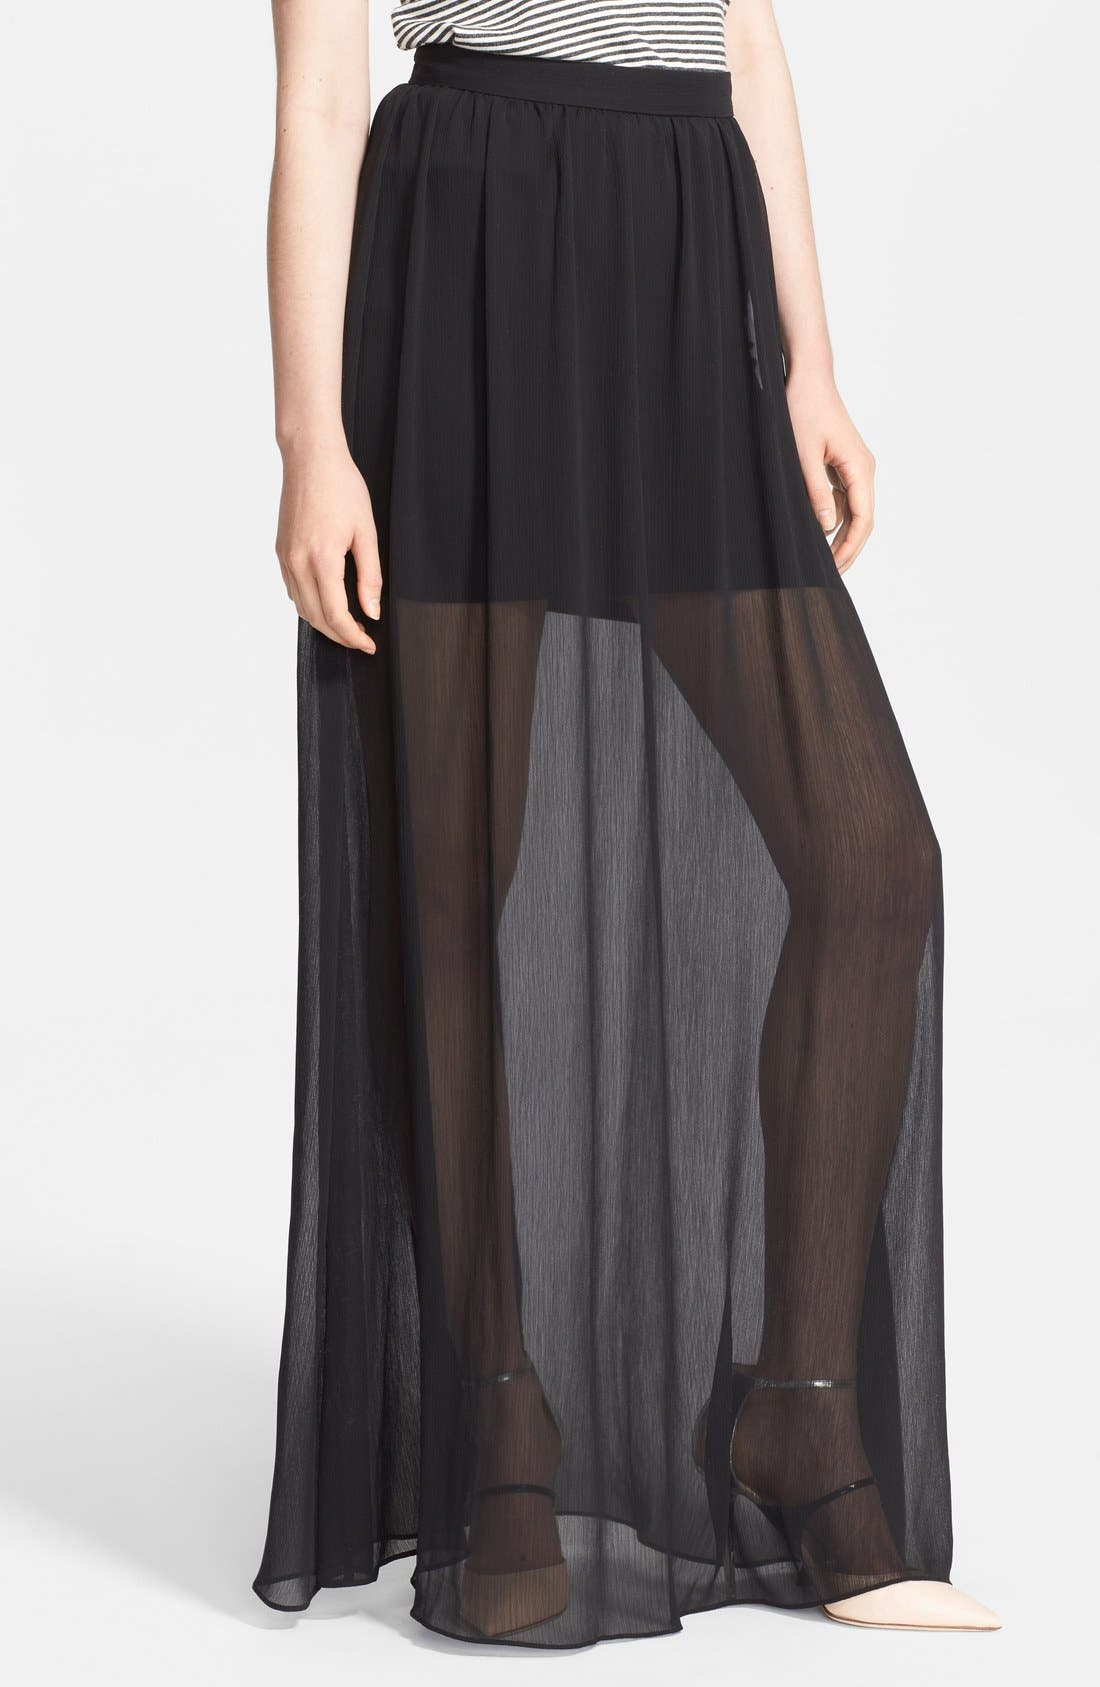 Alternate Image 1 Selected - Alice + Olivia Chiffon Maxi Skirt